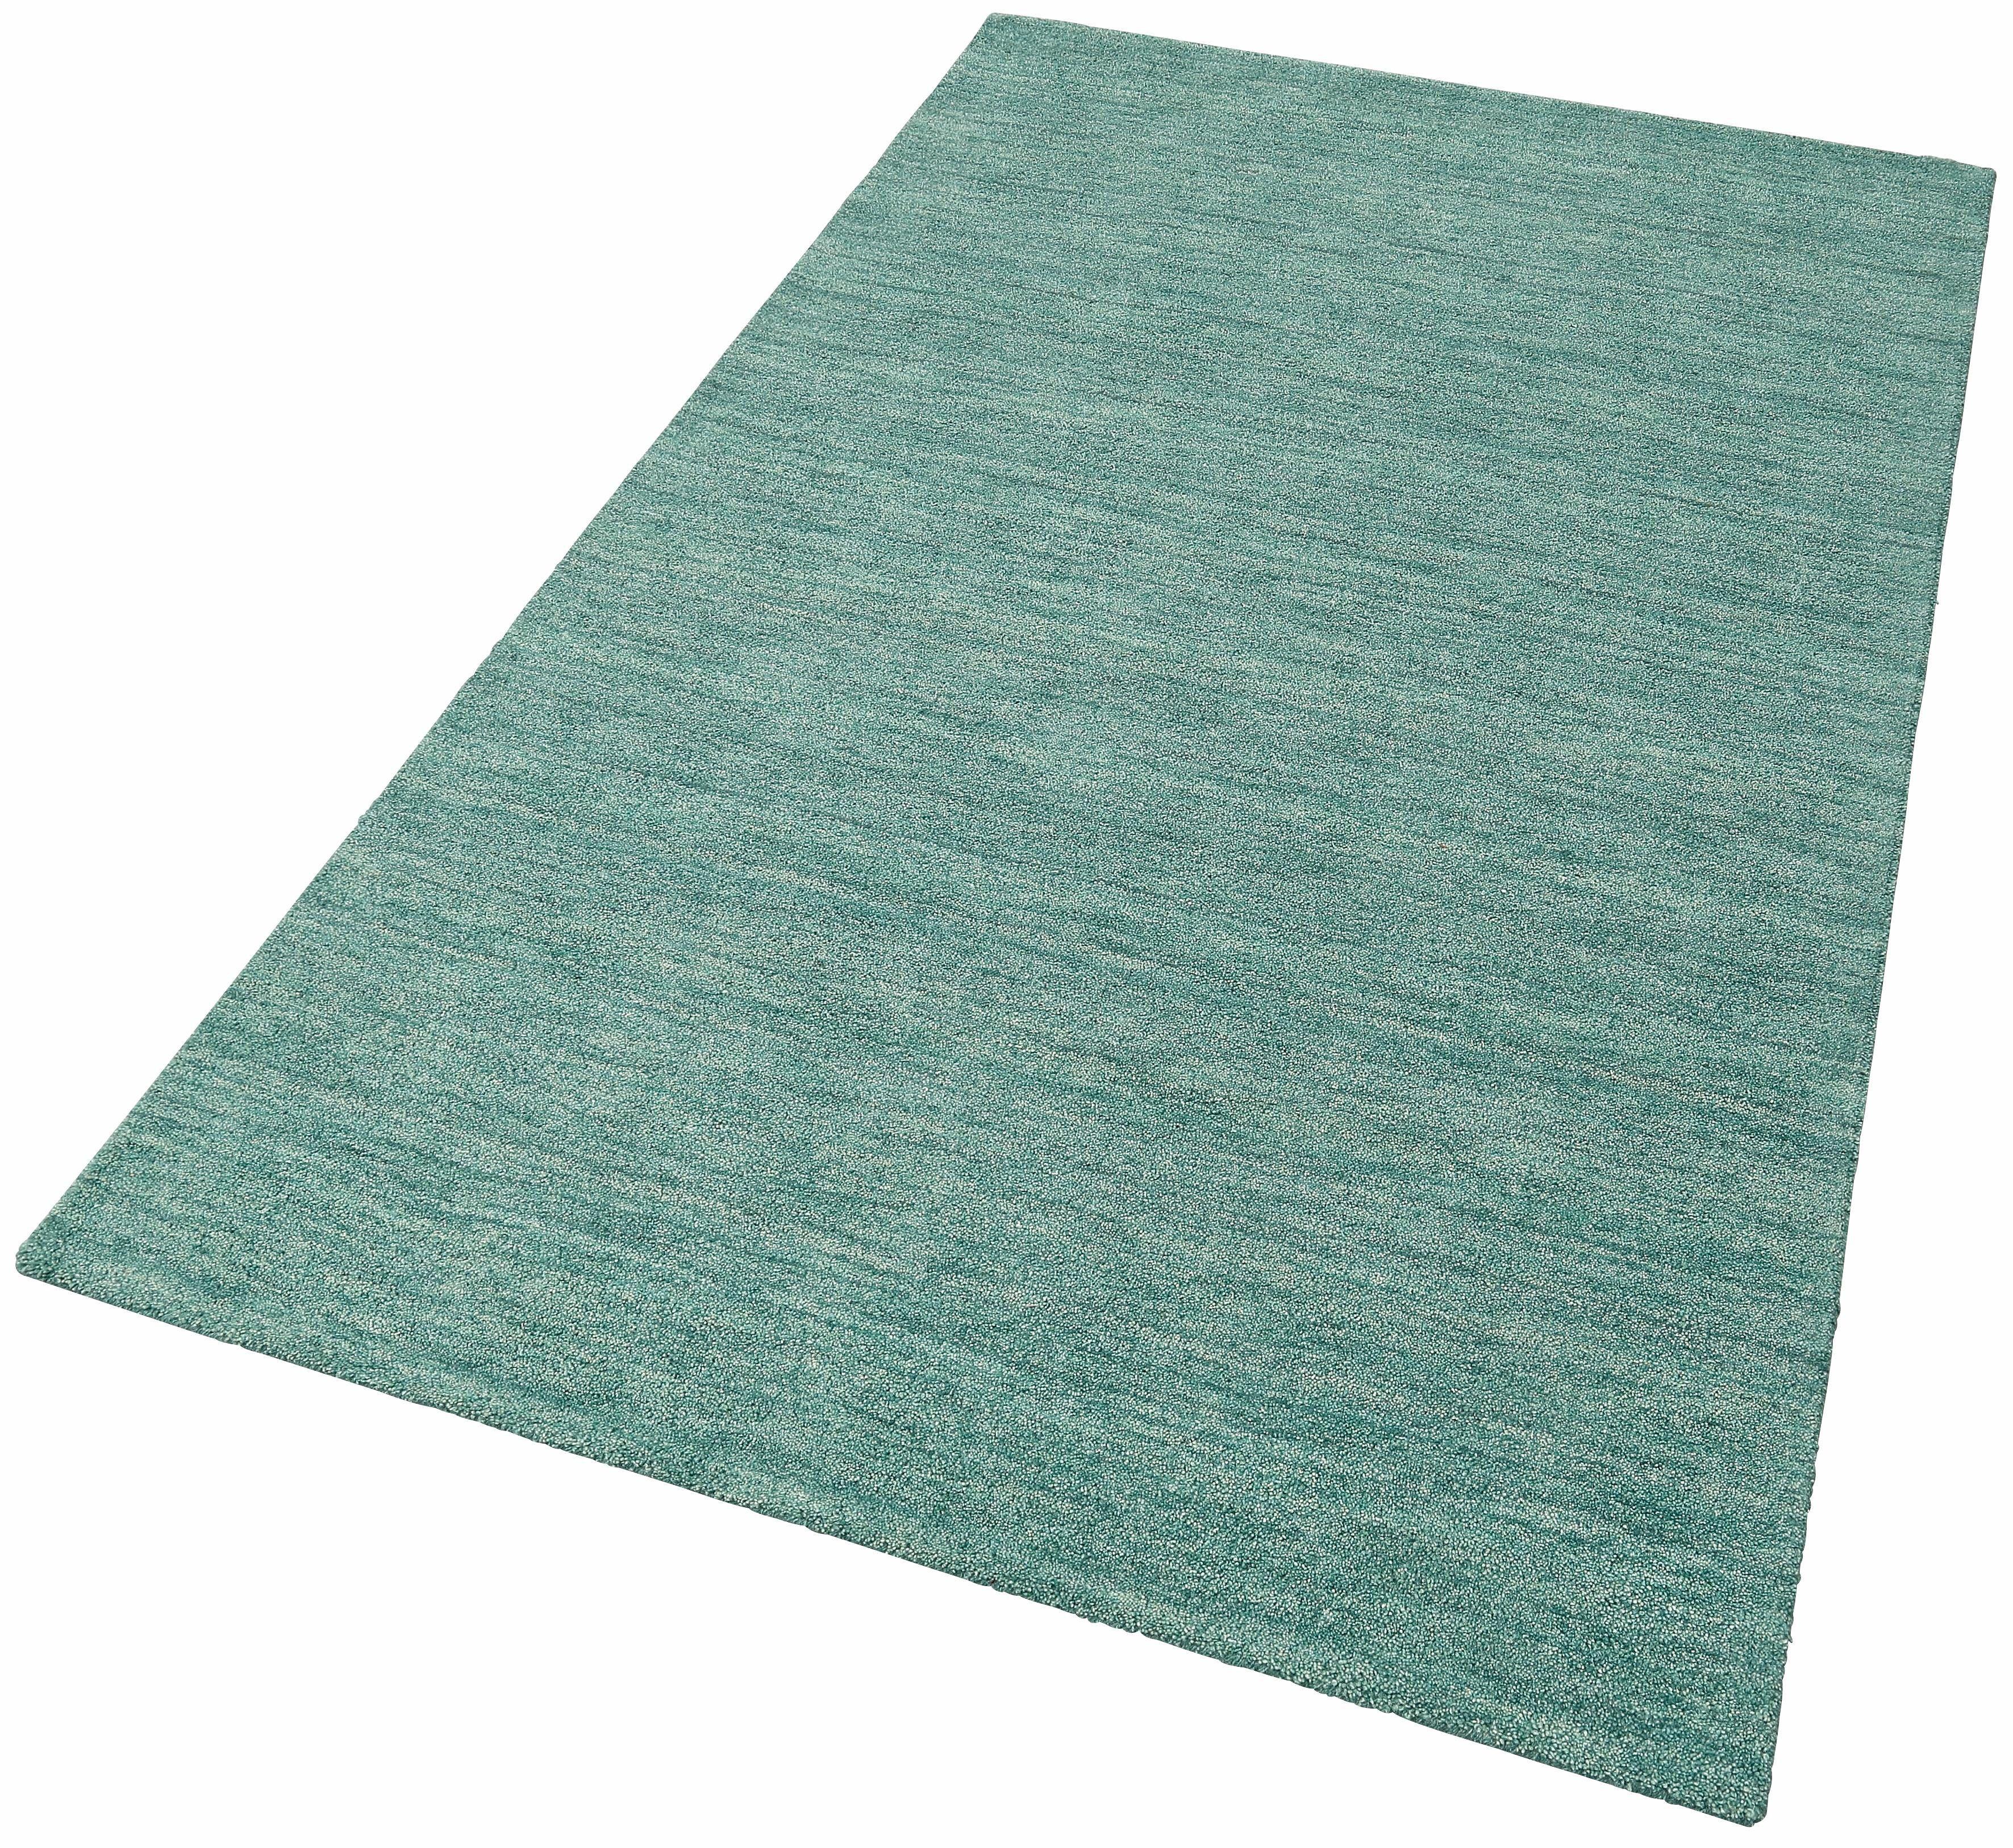 unter teppich amazing teppich unterm bett bett kopfteil rustikal holz teppich deko beige shabby. Black Bedroom Furniture Sets. Home Design Ideas